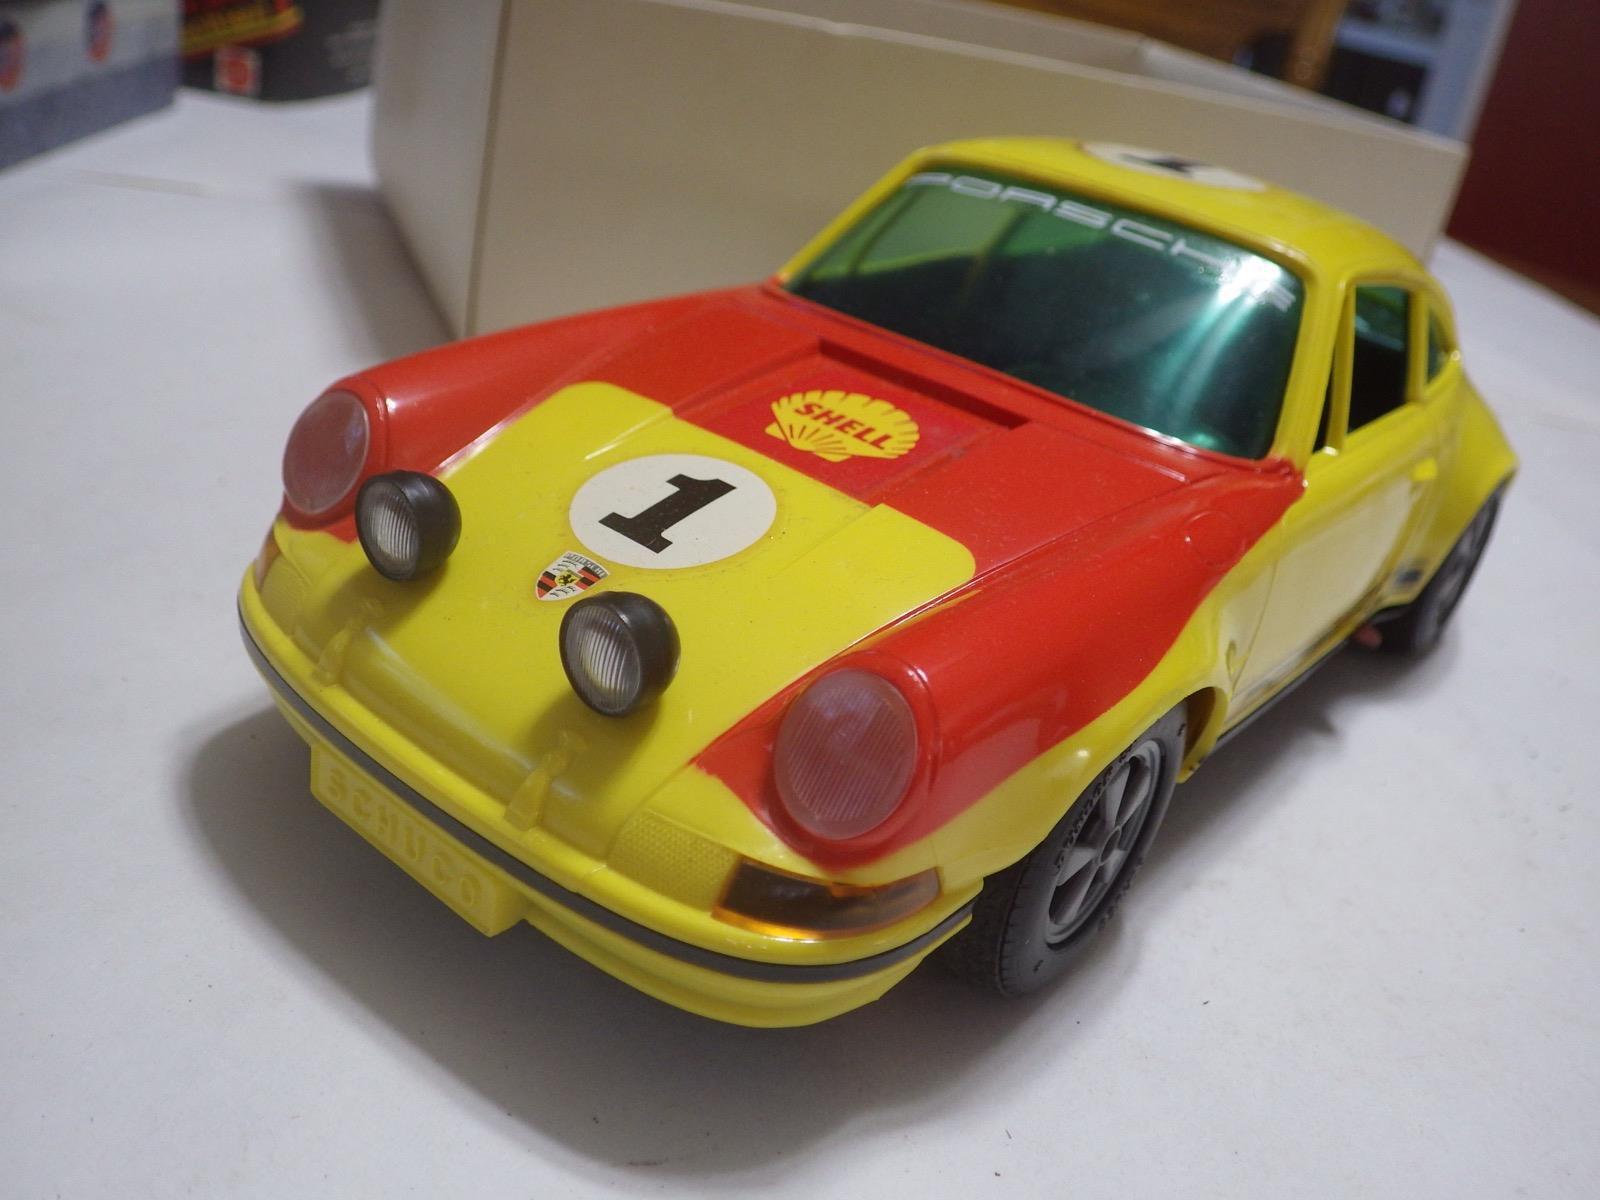 compra en línea hoy Schuco (Alemania) amarillorojo Porsche Porsche Porsche R Coupe Rally De Plásticoeléctrica 1:16 Nuevo En Caja  las mejores marcas venden barato